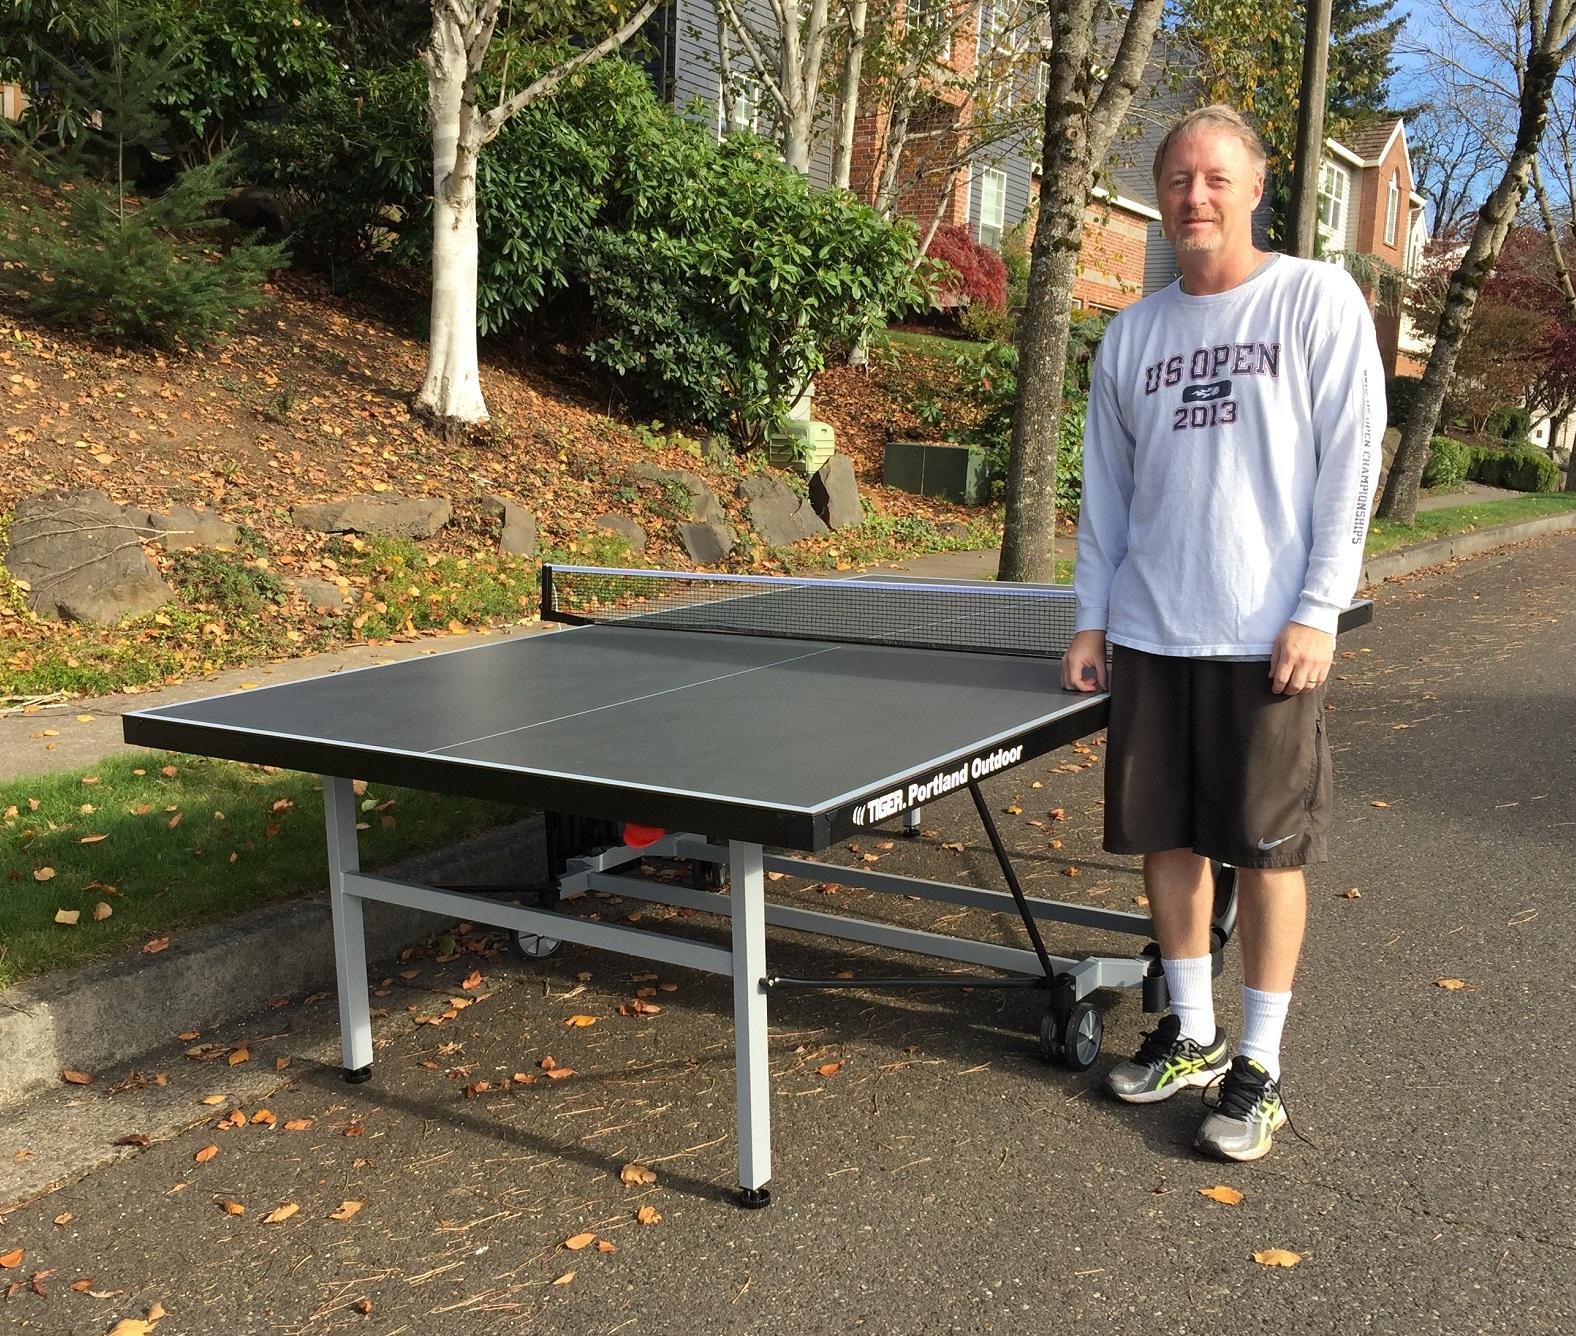 Tiger Pingpong Portland Outdoor Table